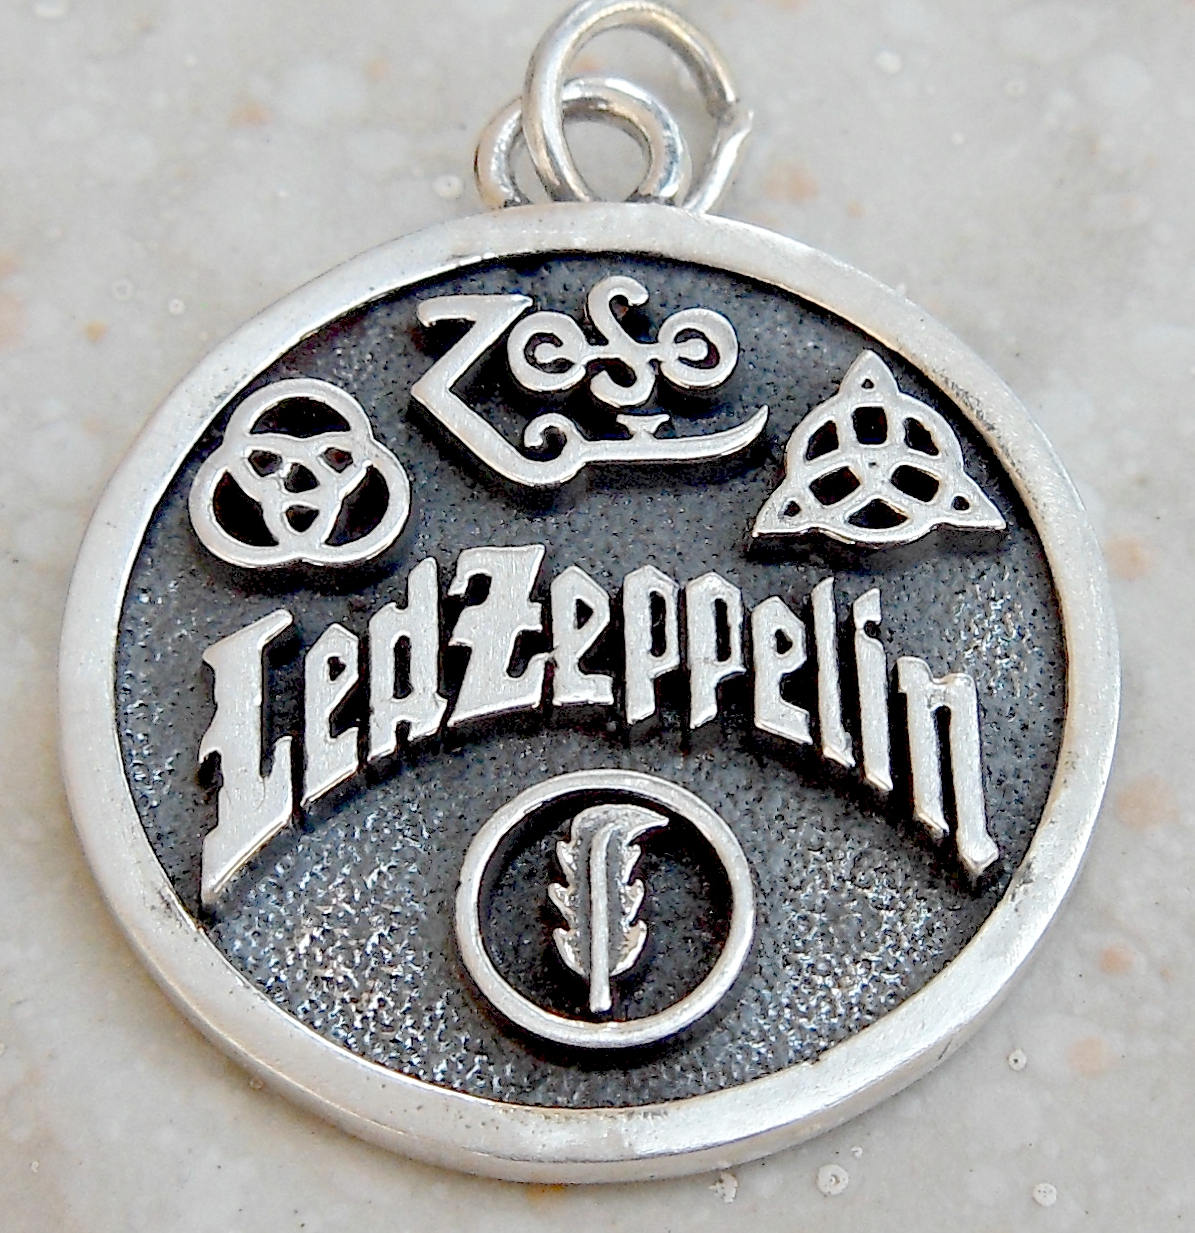 Led zeppelin swan song zoso 4 symbols 3d pendant solid description led zeppelin biocorpaavc